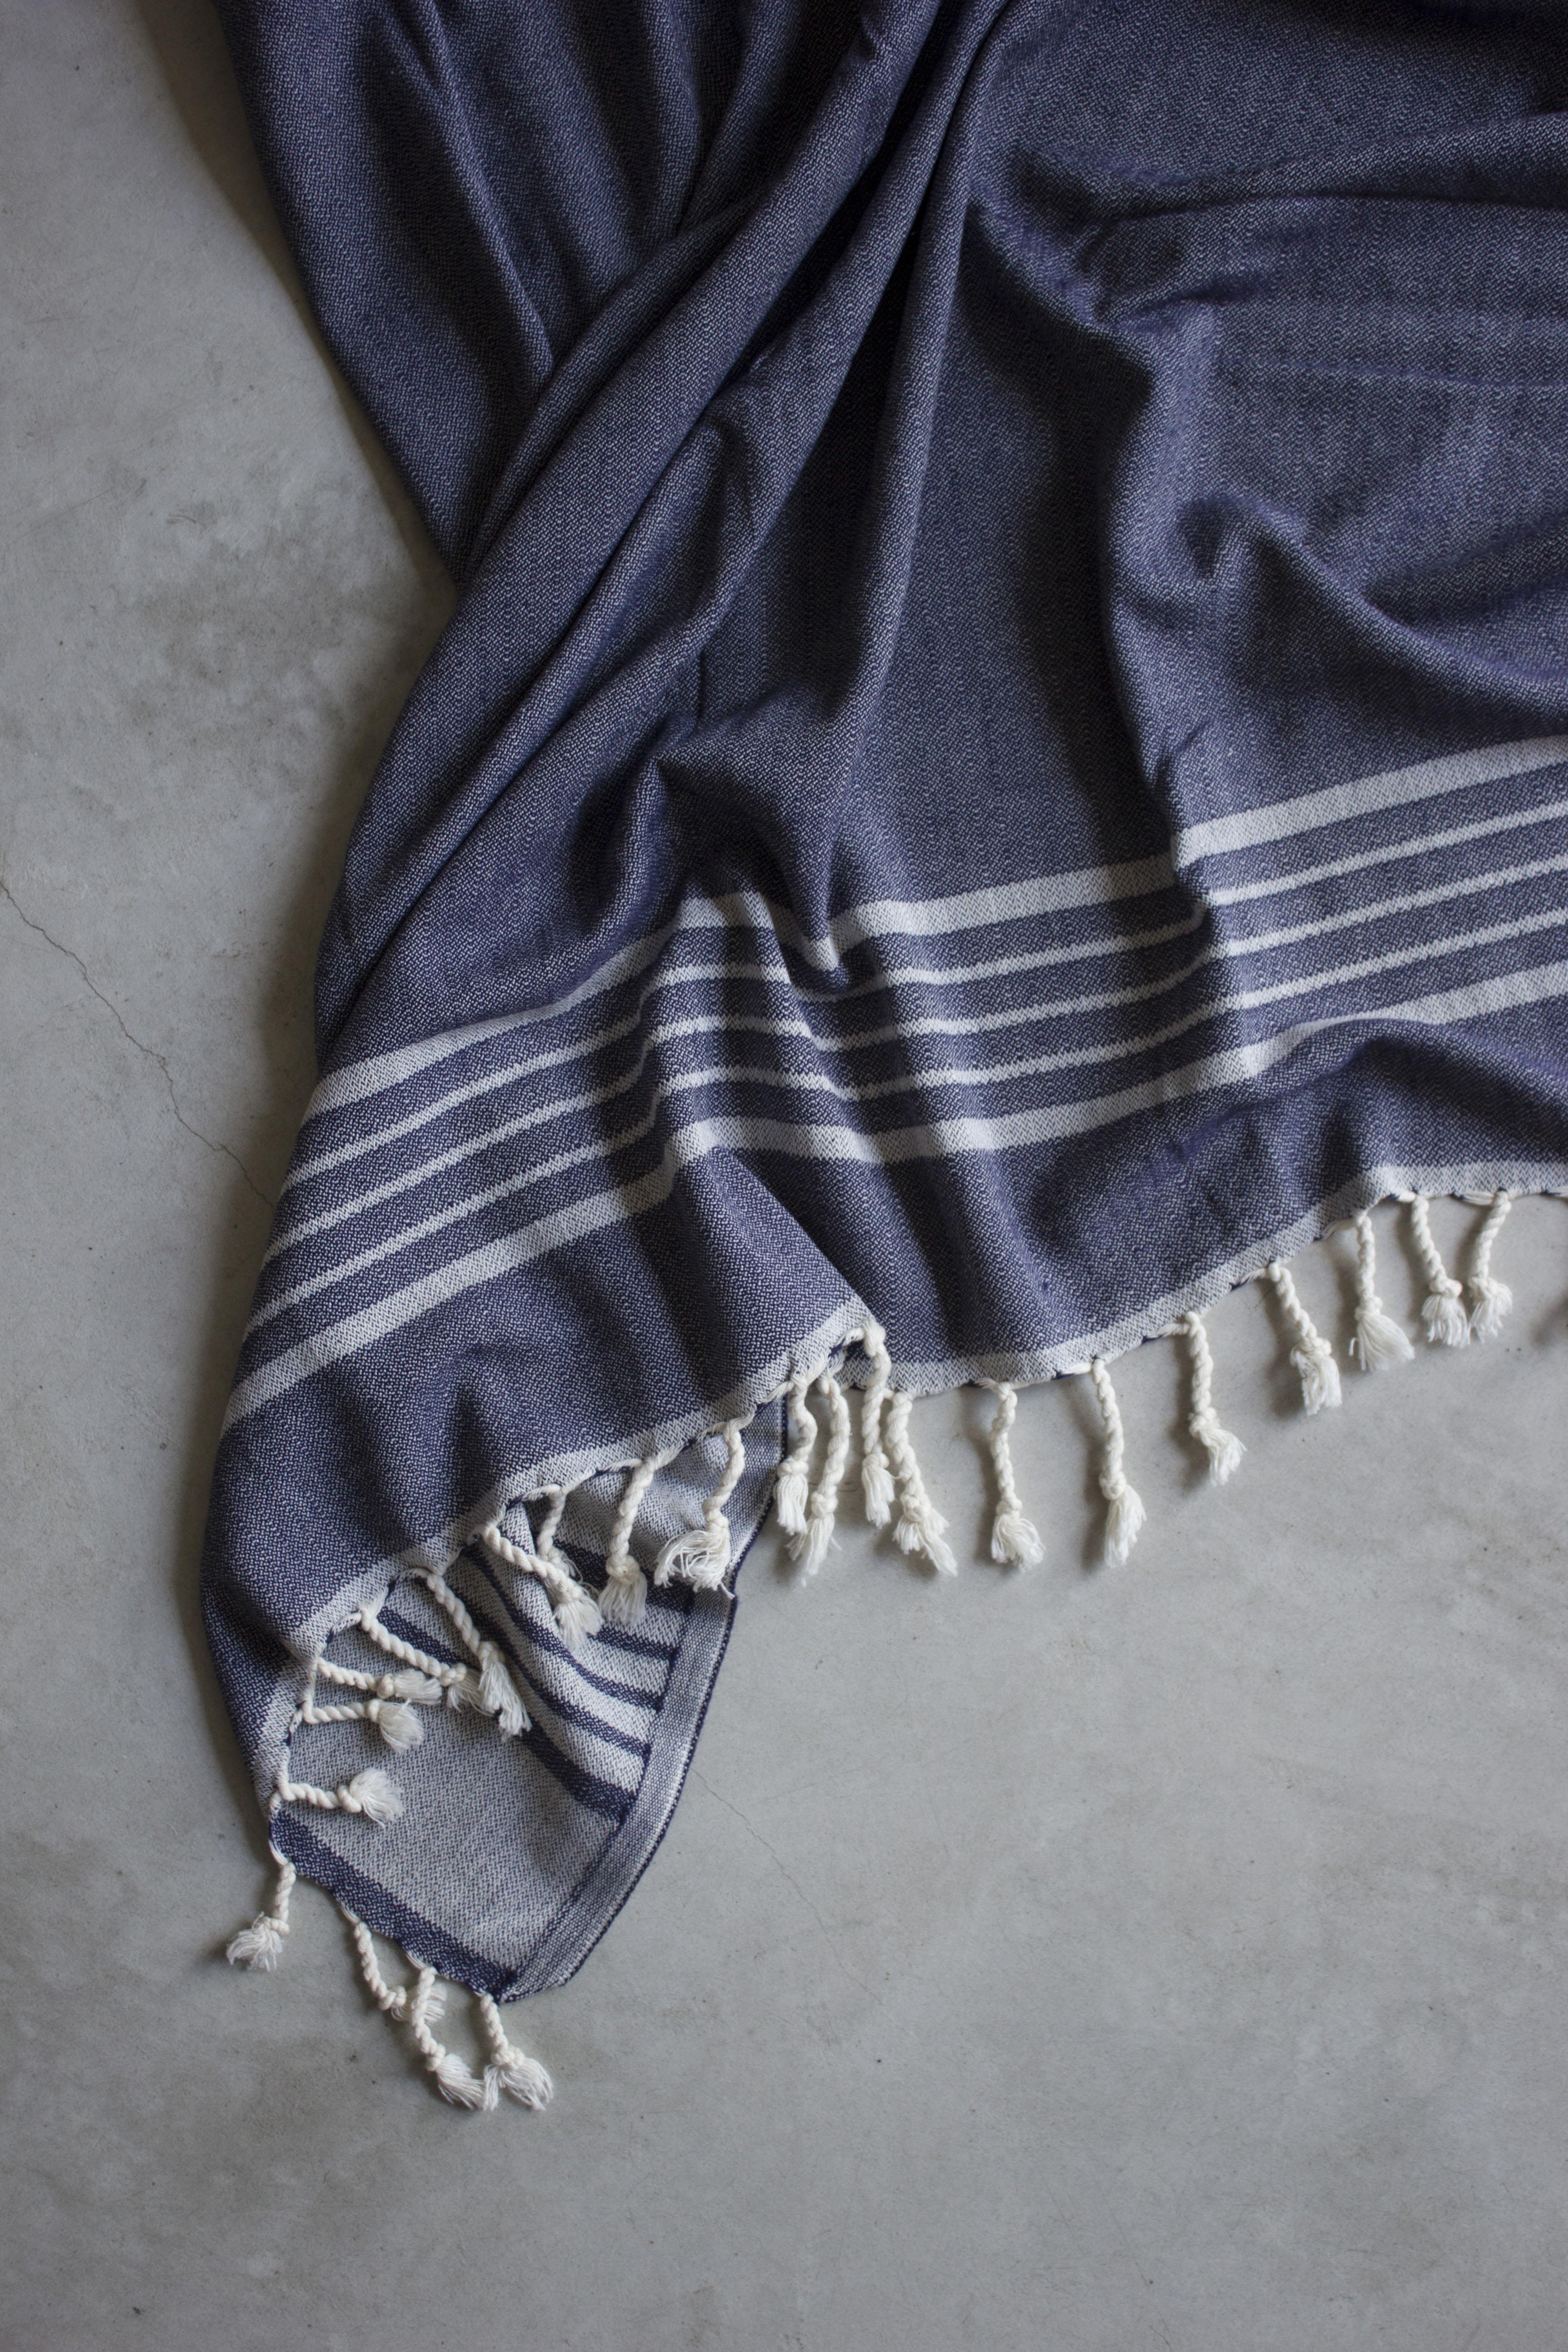 Towel 71 low res